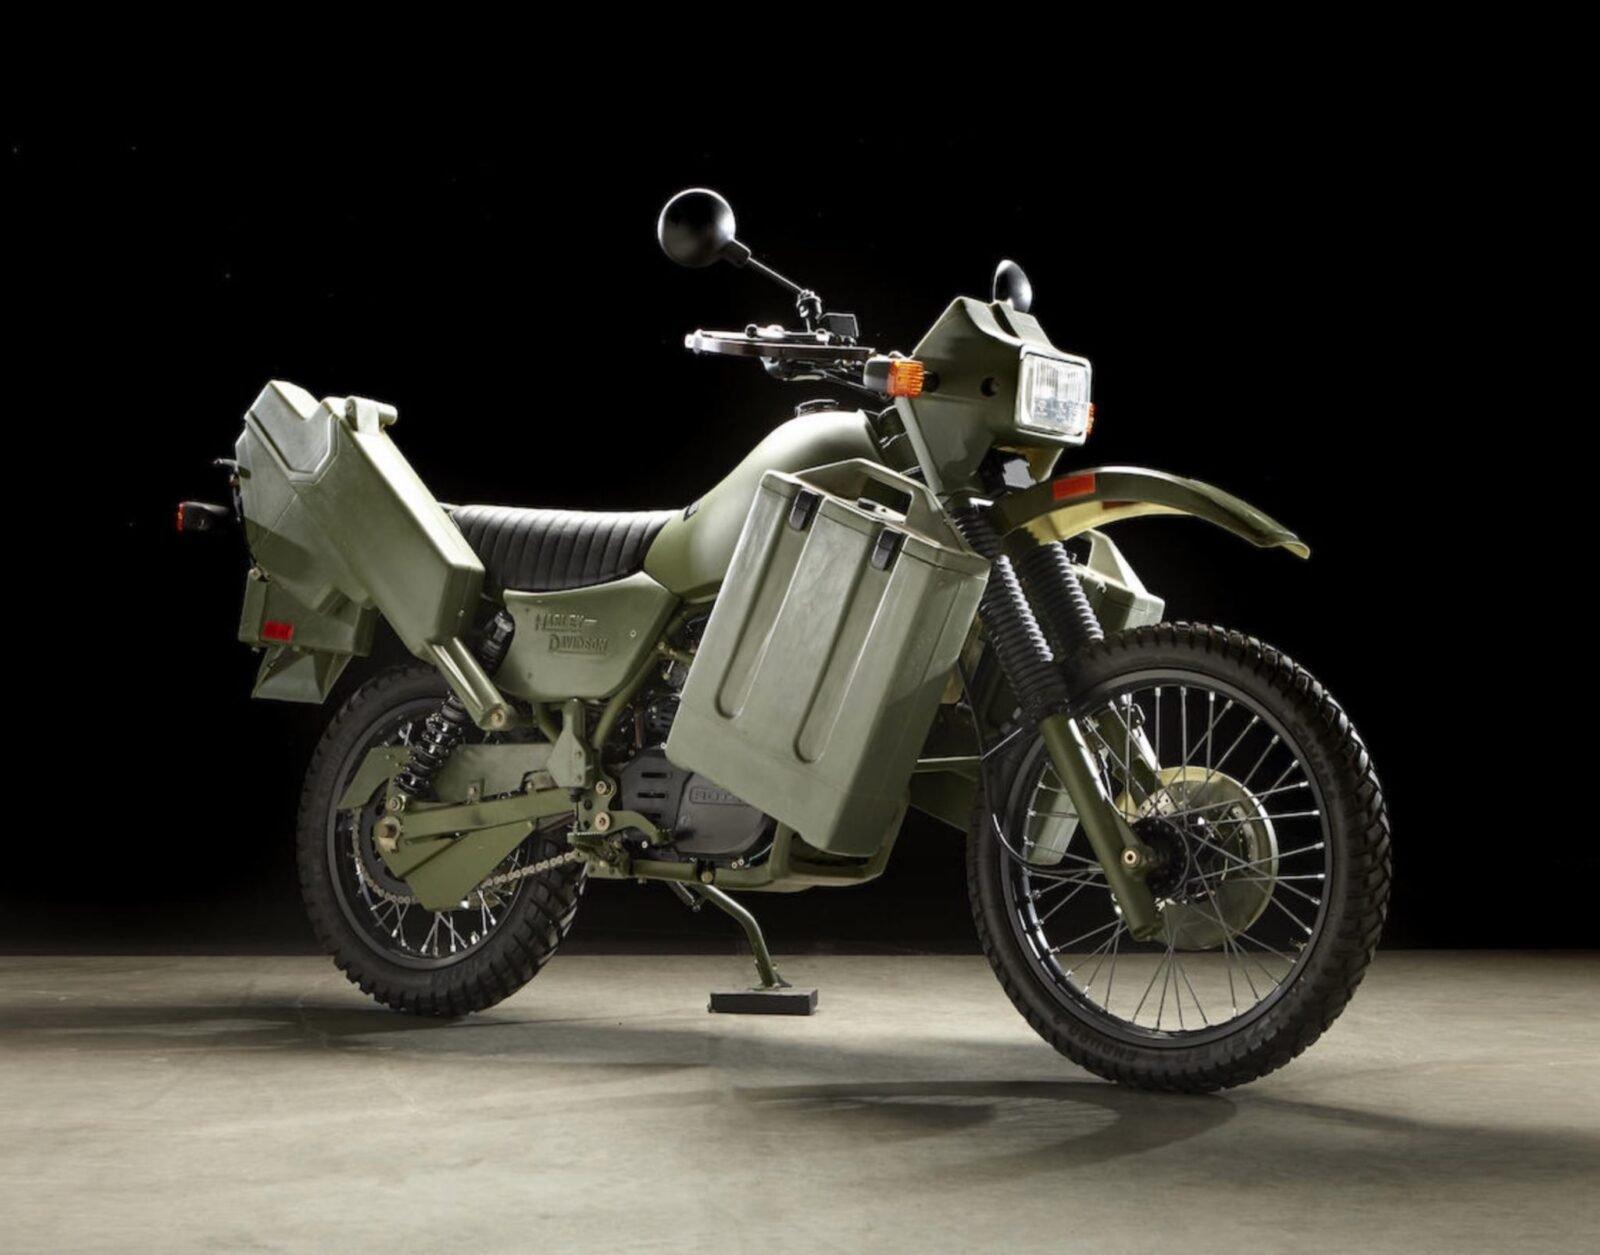 Harley Davidson MT500 6 1600x1255 - Harley-Davidson MT500